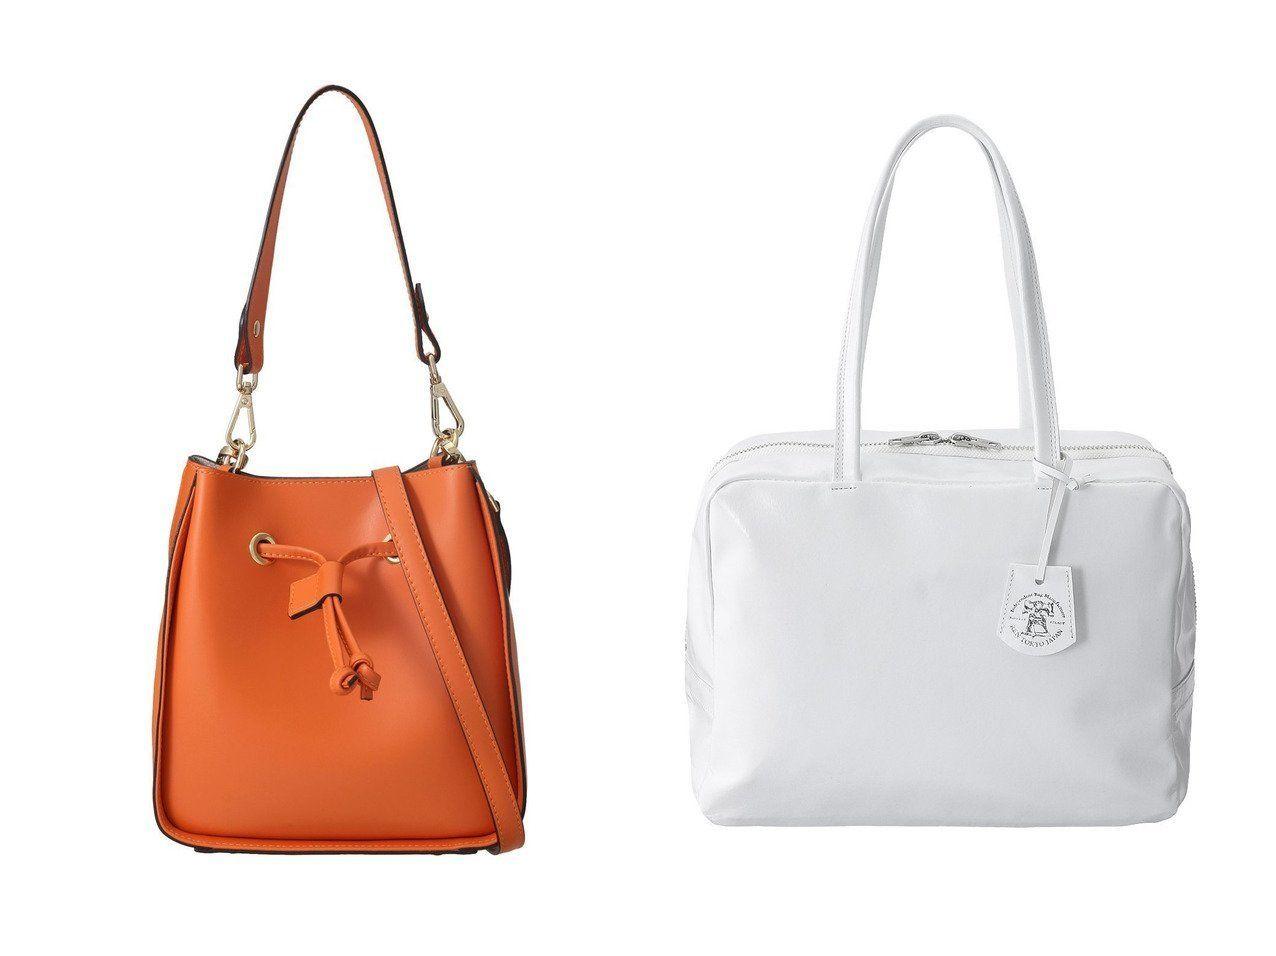 5d4d3303d79b バッグ・鞄のおすすめ!人気、ファッションの通販 【PLAIN PEOPLE/プレイン